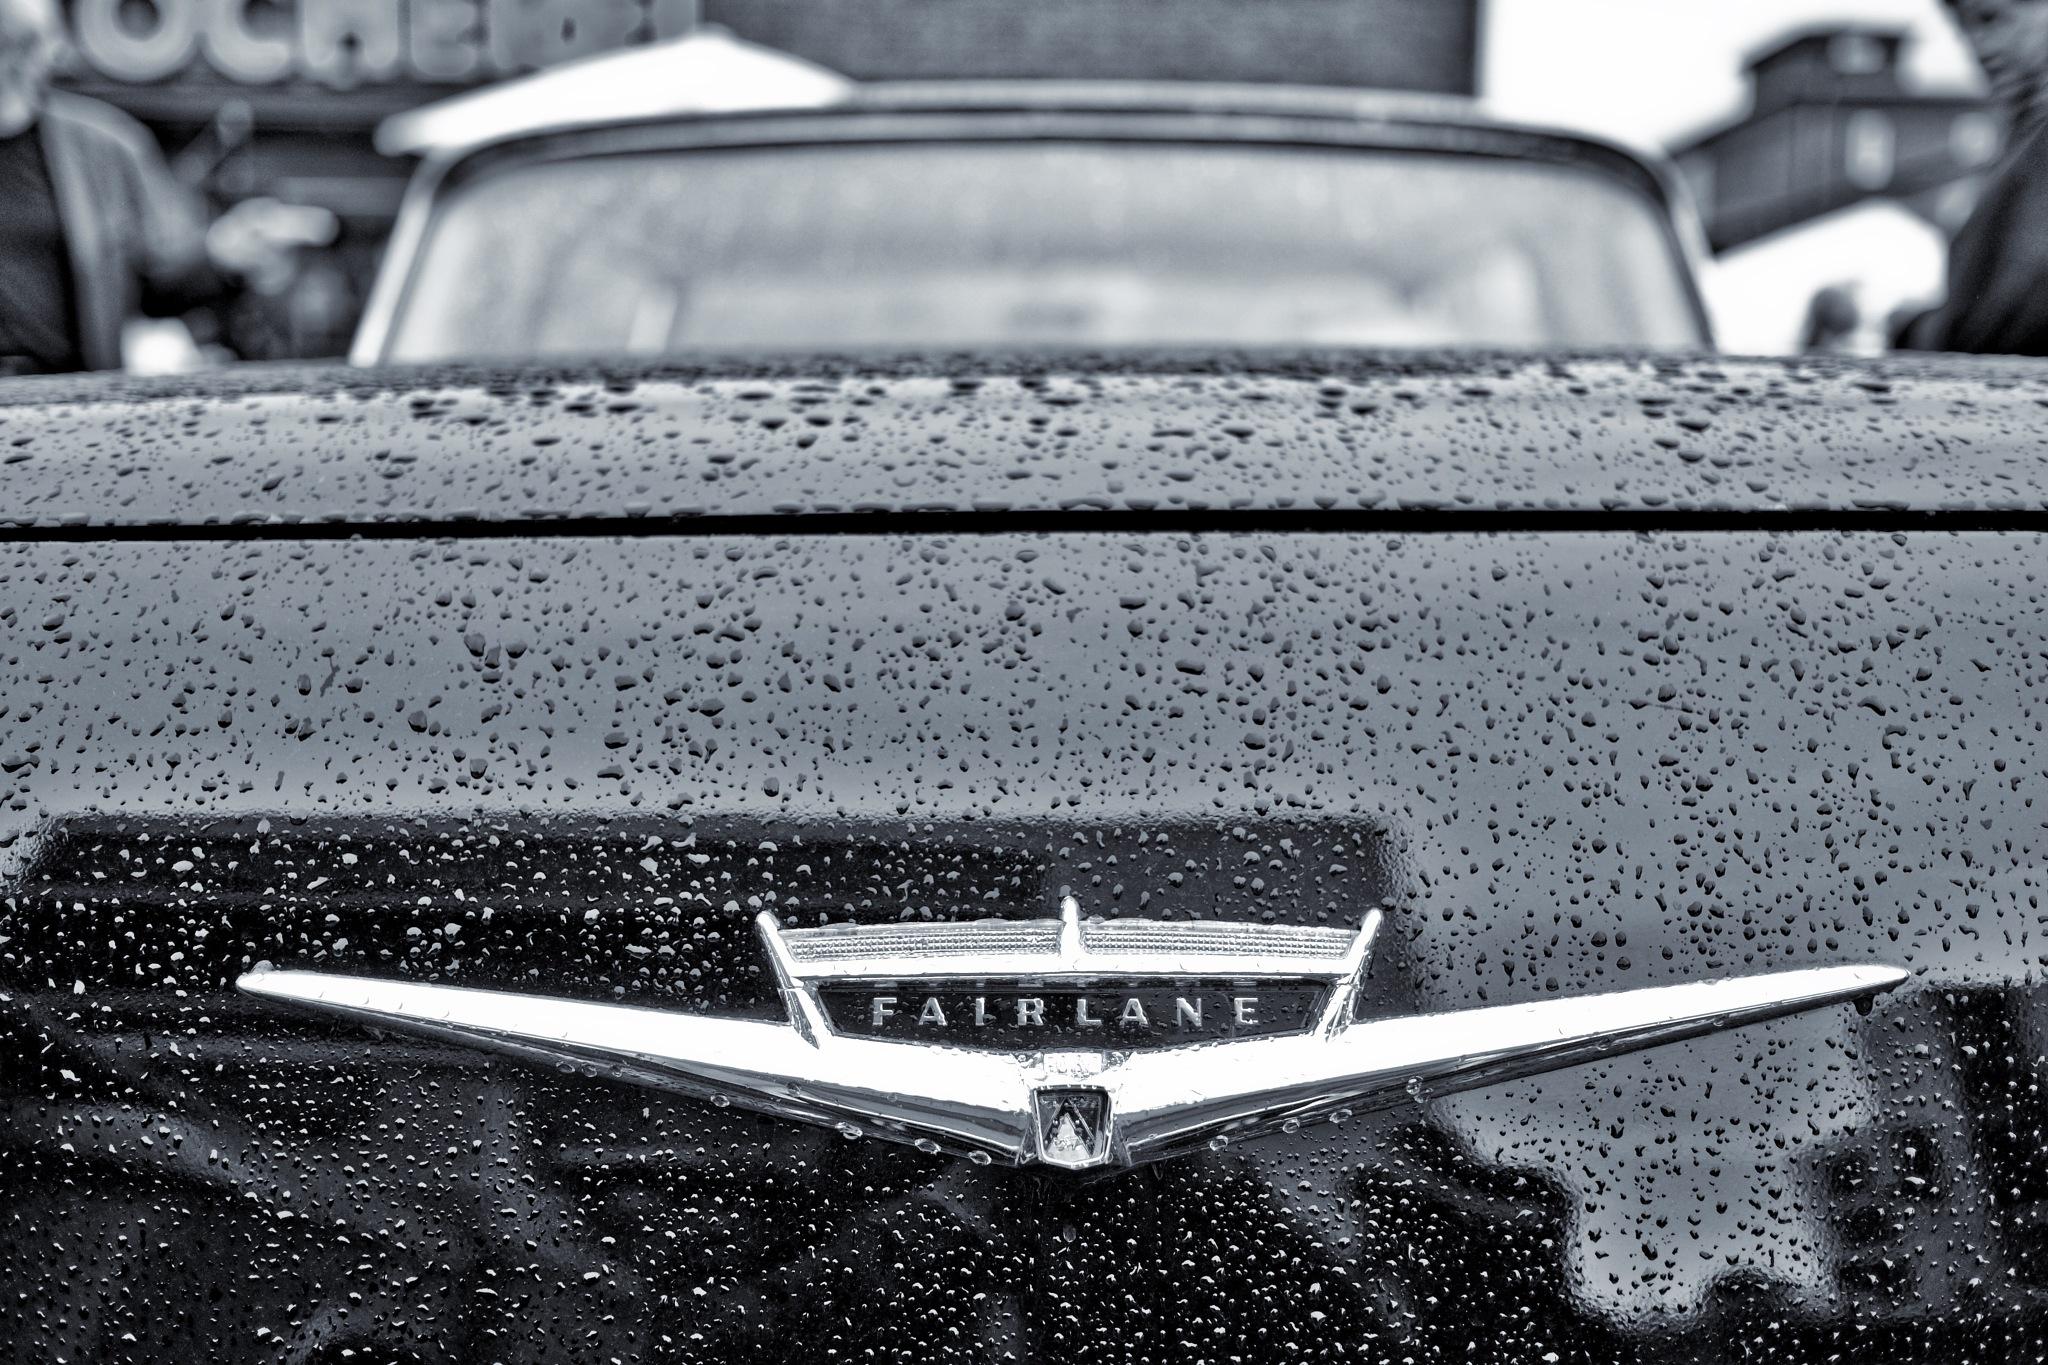 Ford Fairlane  by peterkryzun